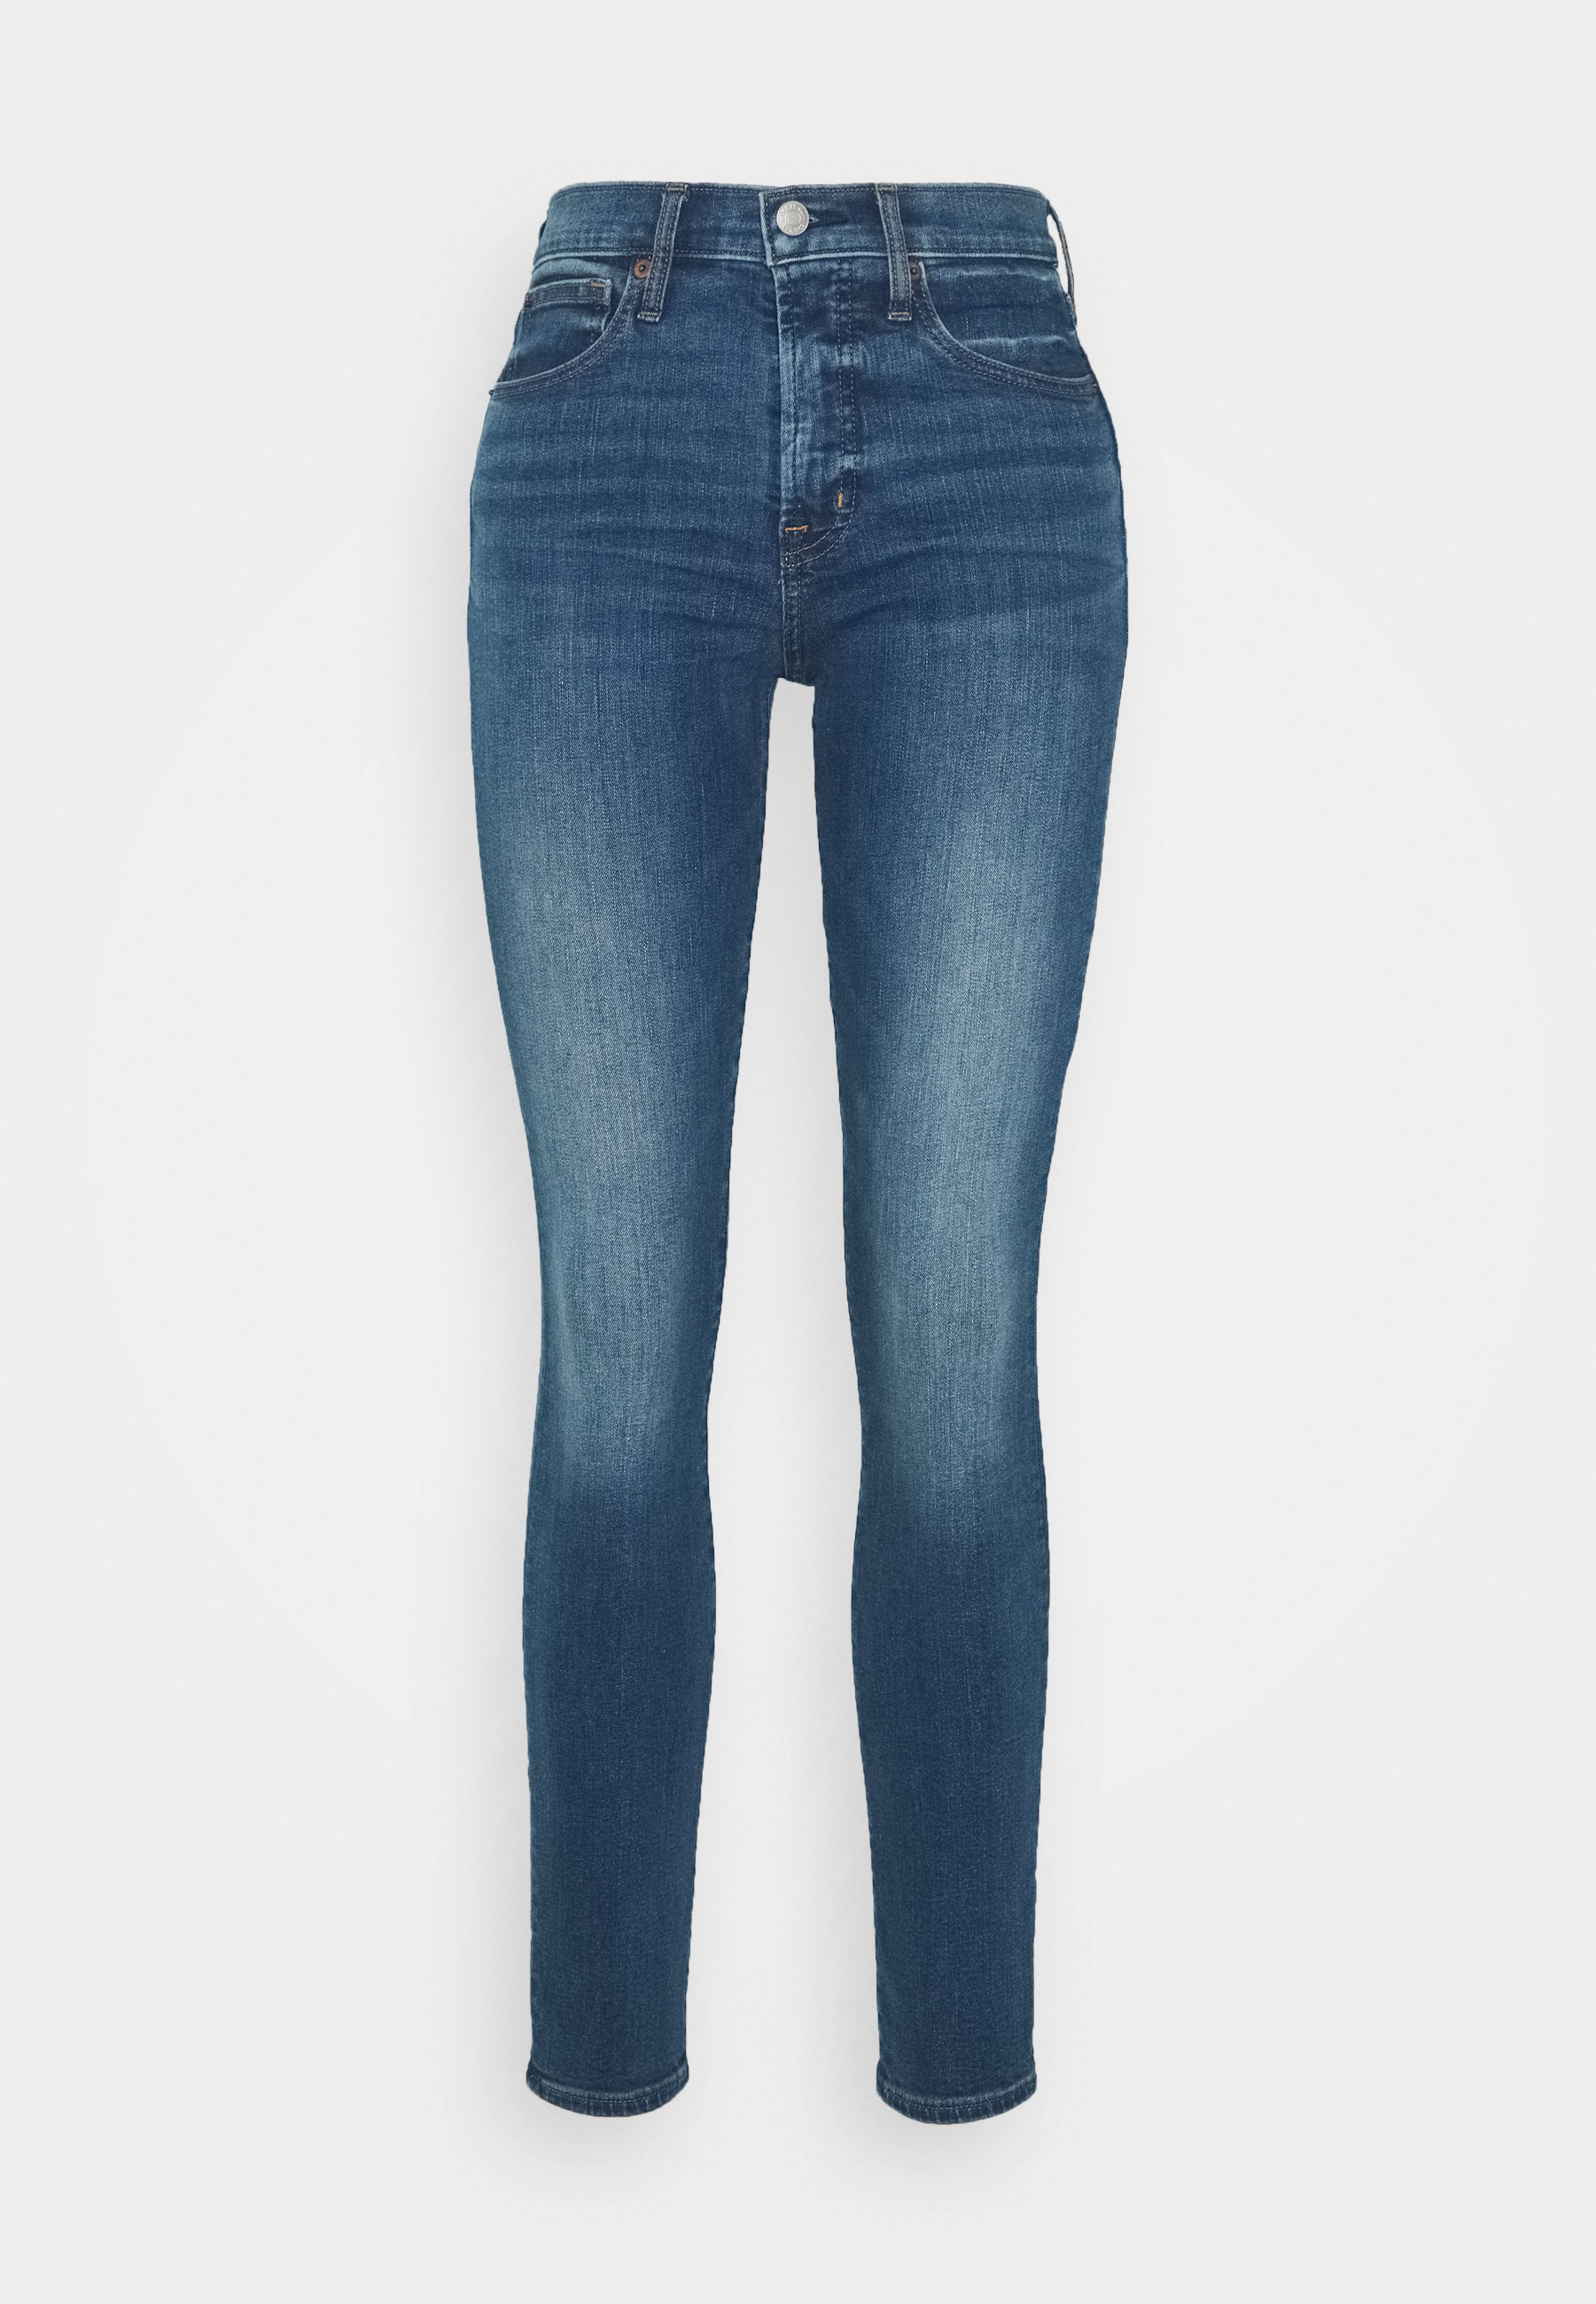 Gap Charlotte - Jeans Skinny Fit Medium Indigo 6